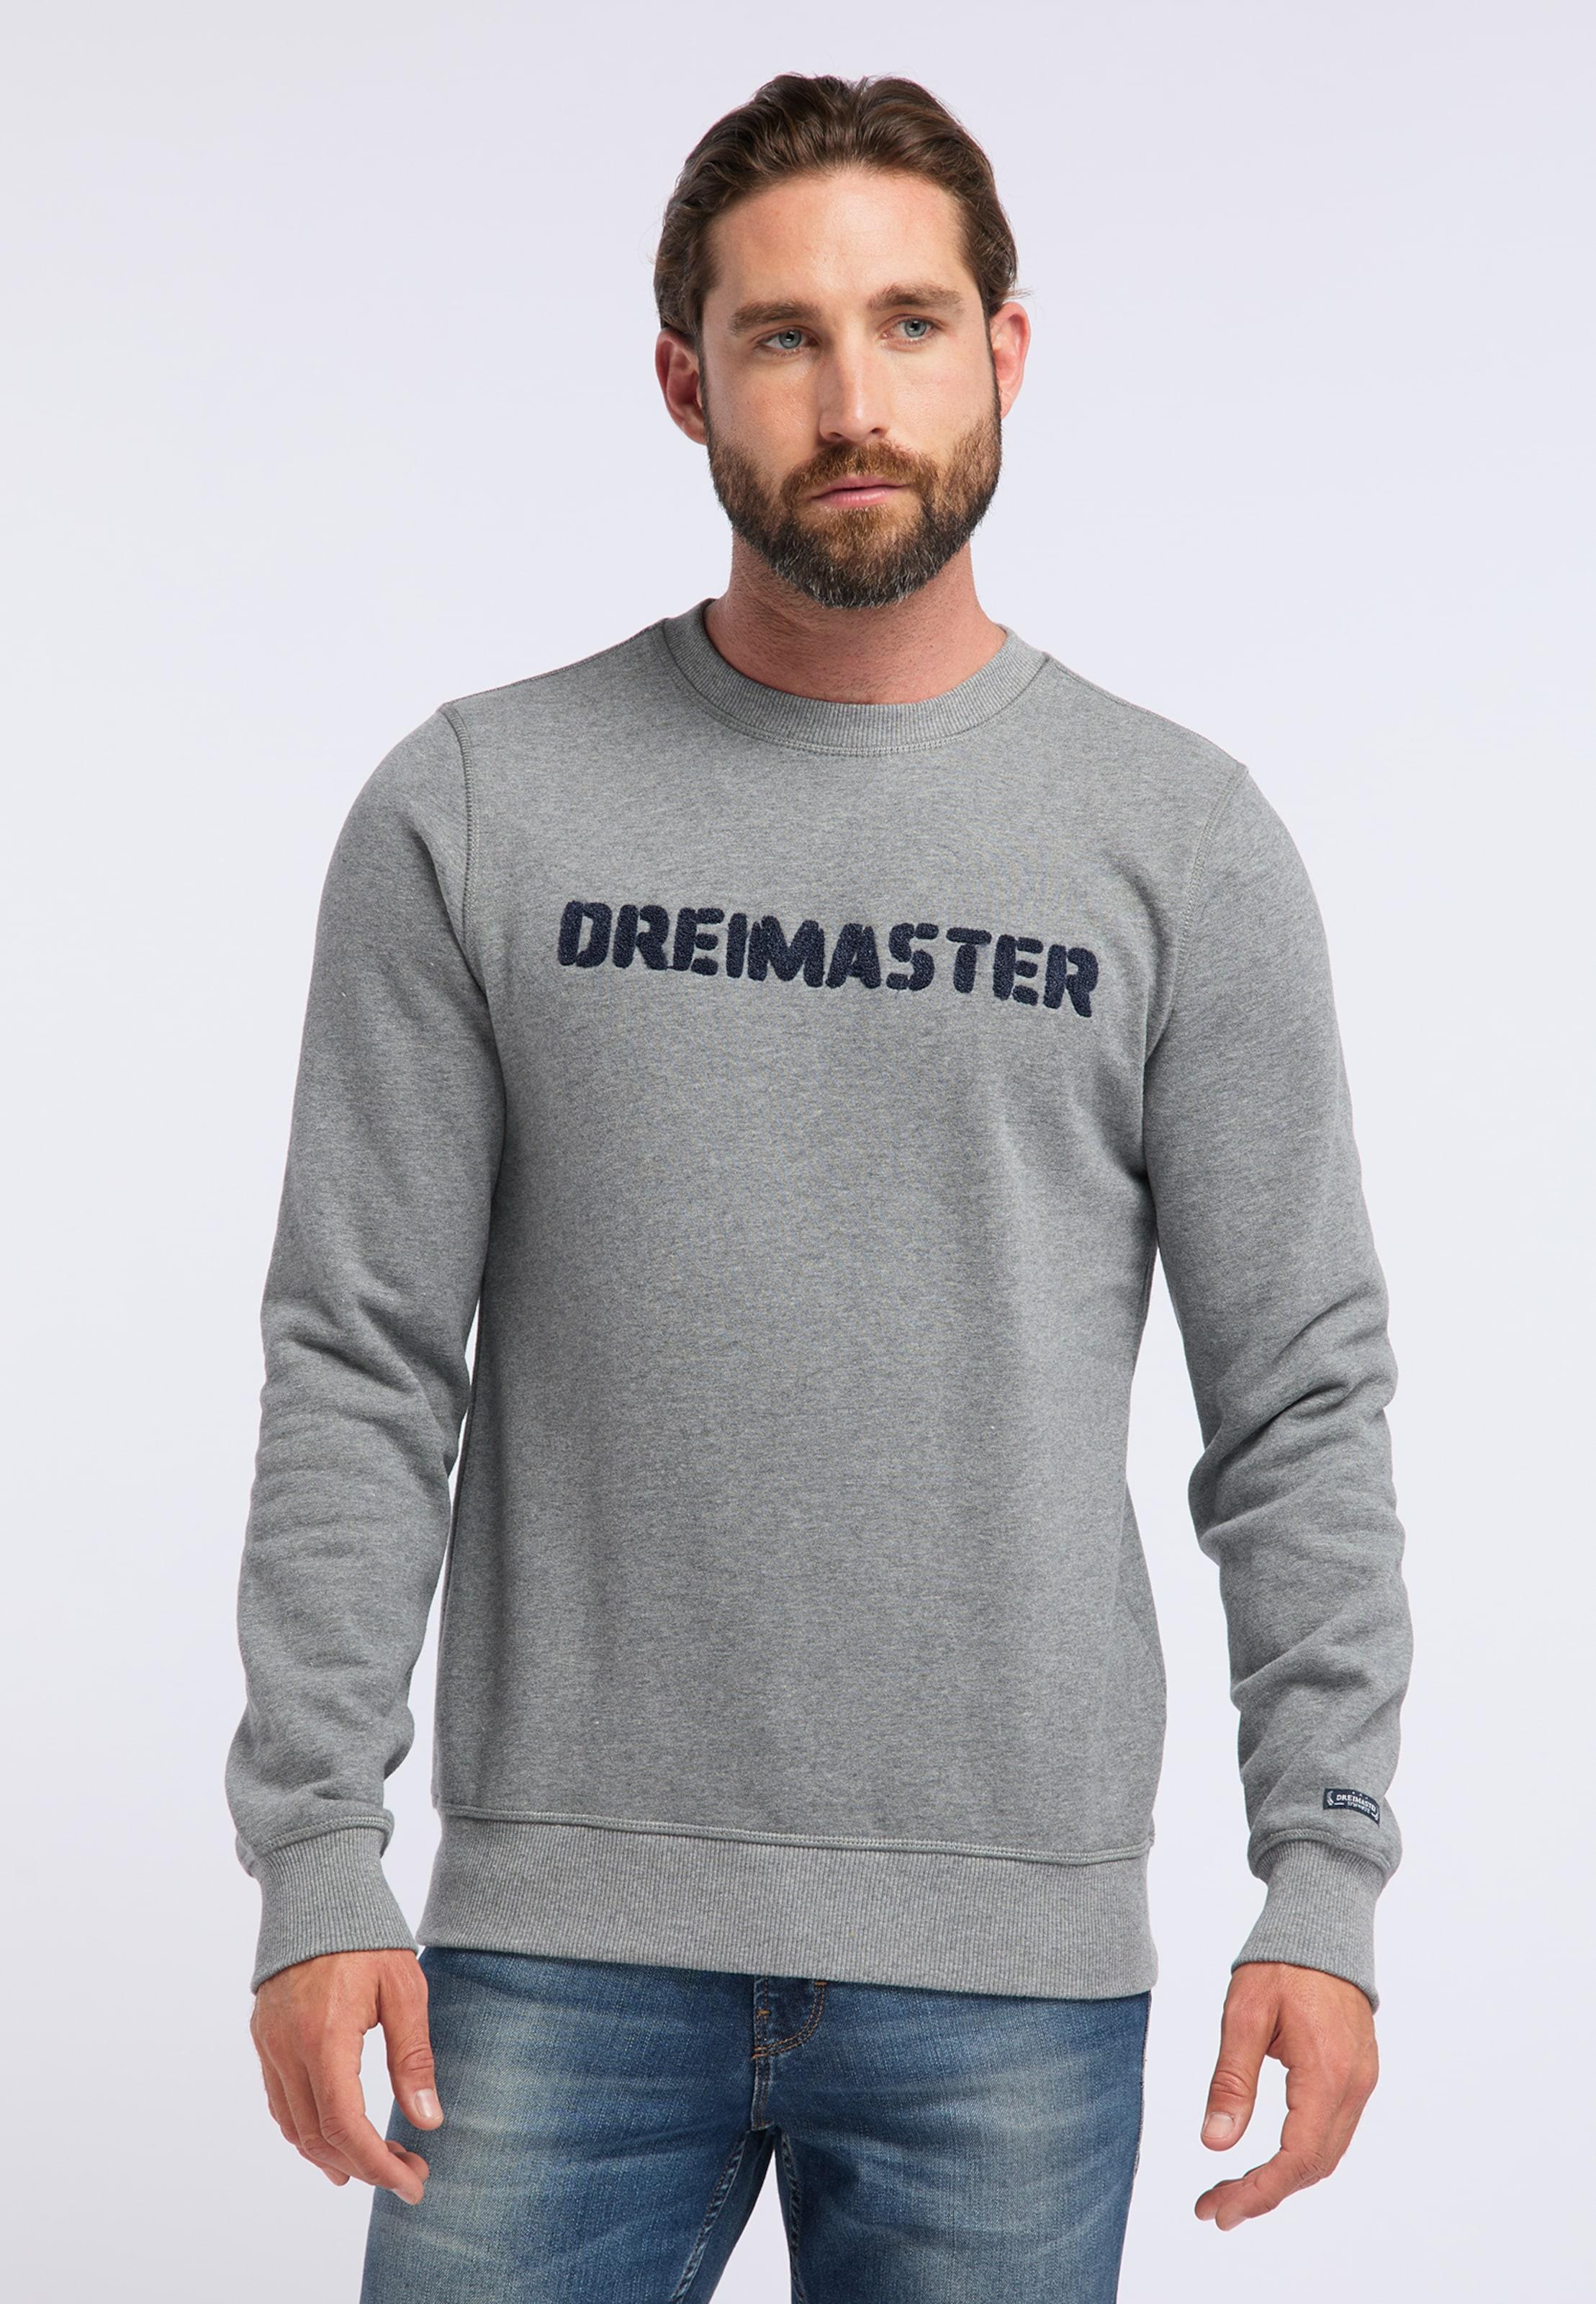 Maritim In Sweatshirt Maritim In Dreimaster Grau Sweatshirt In Dreimaster Sweatshirt Dreimaster Grau Maritim dBrxWQCoeE